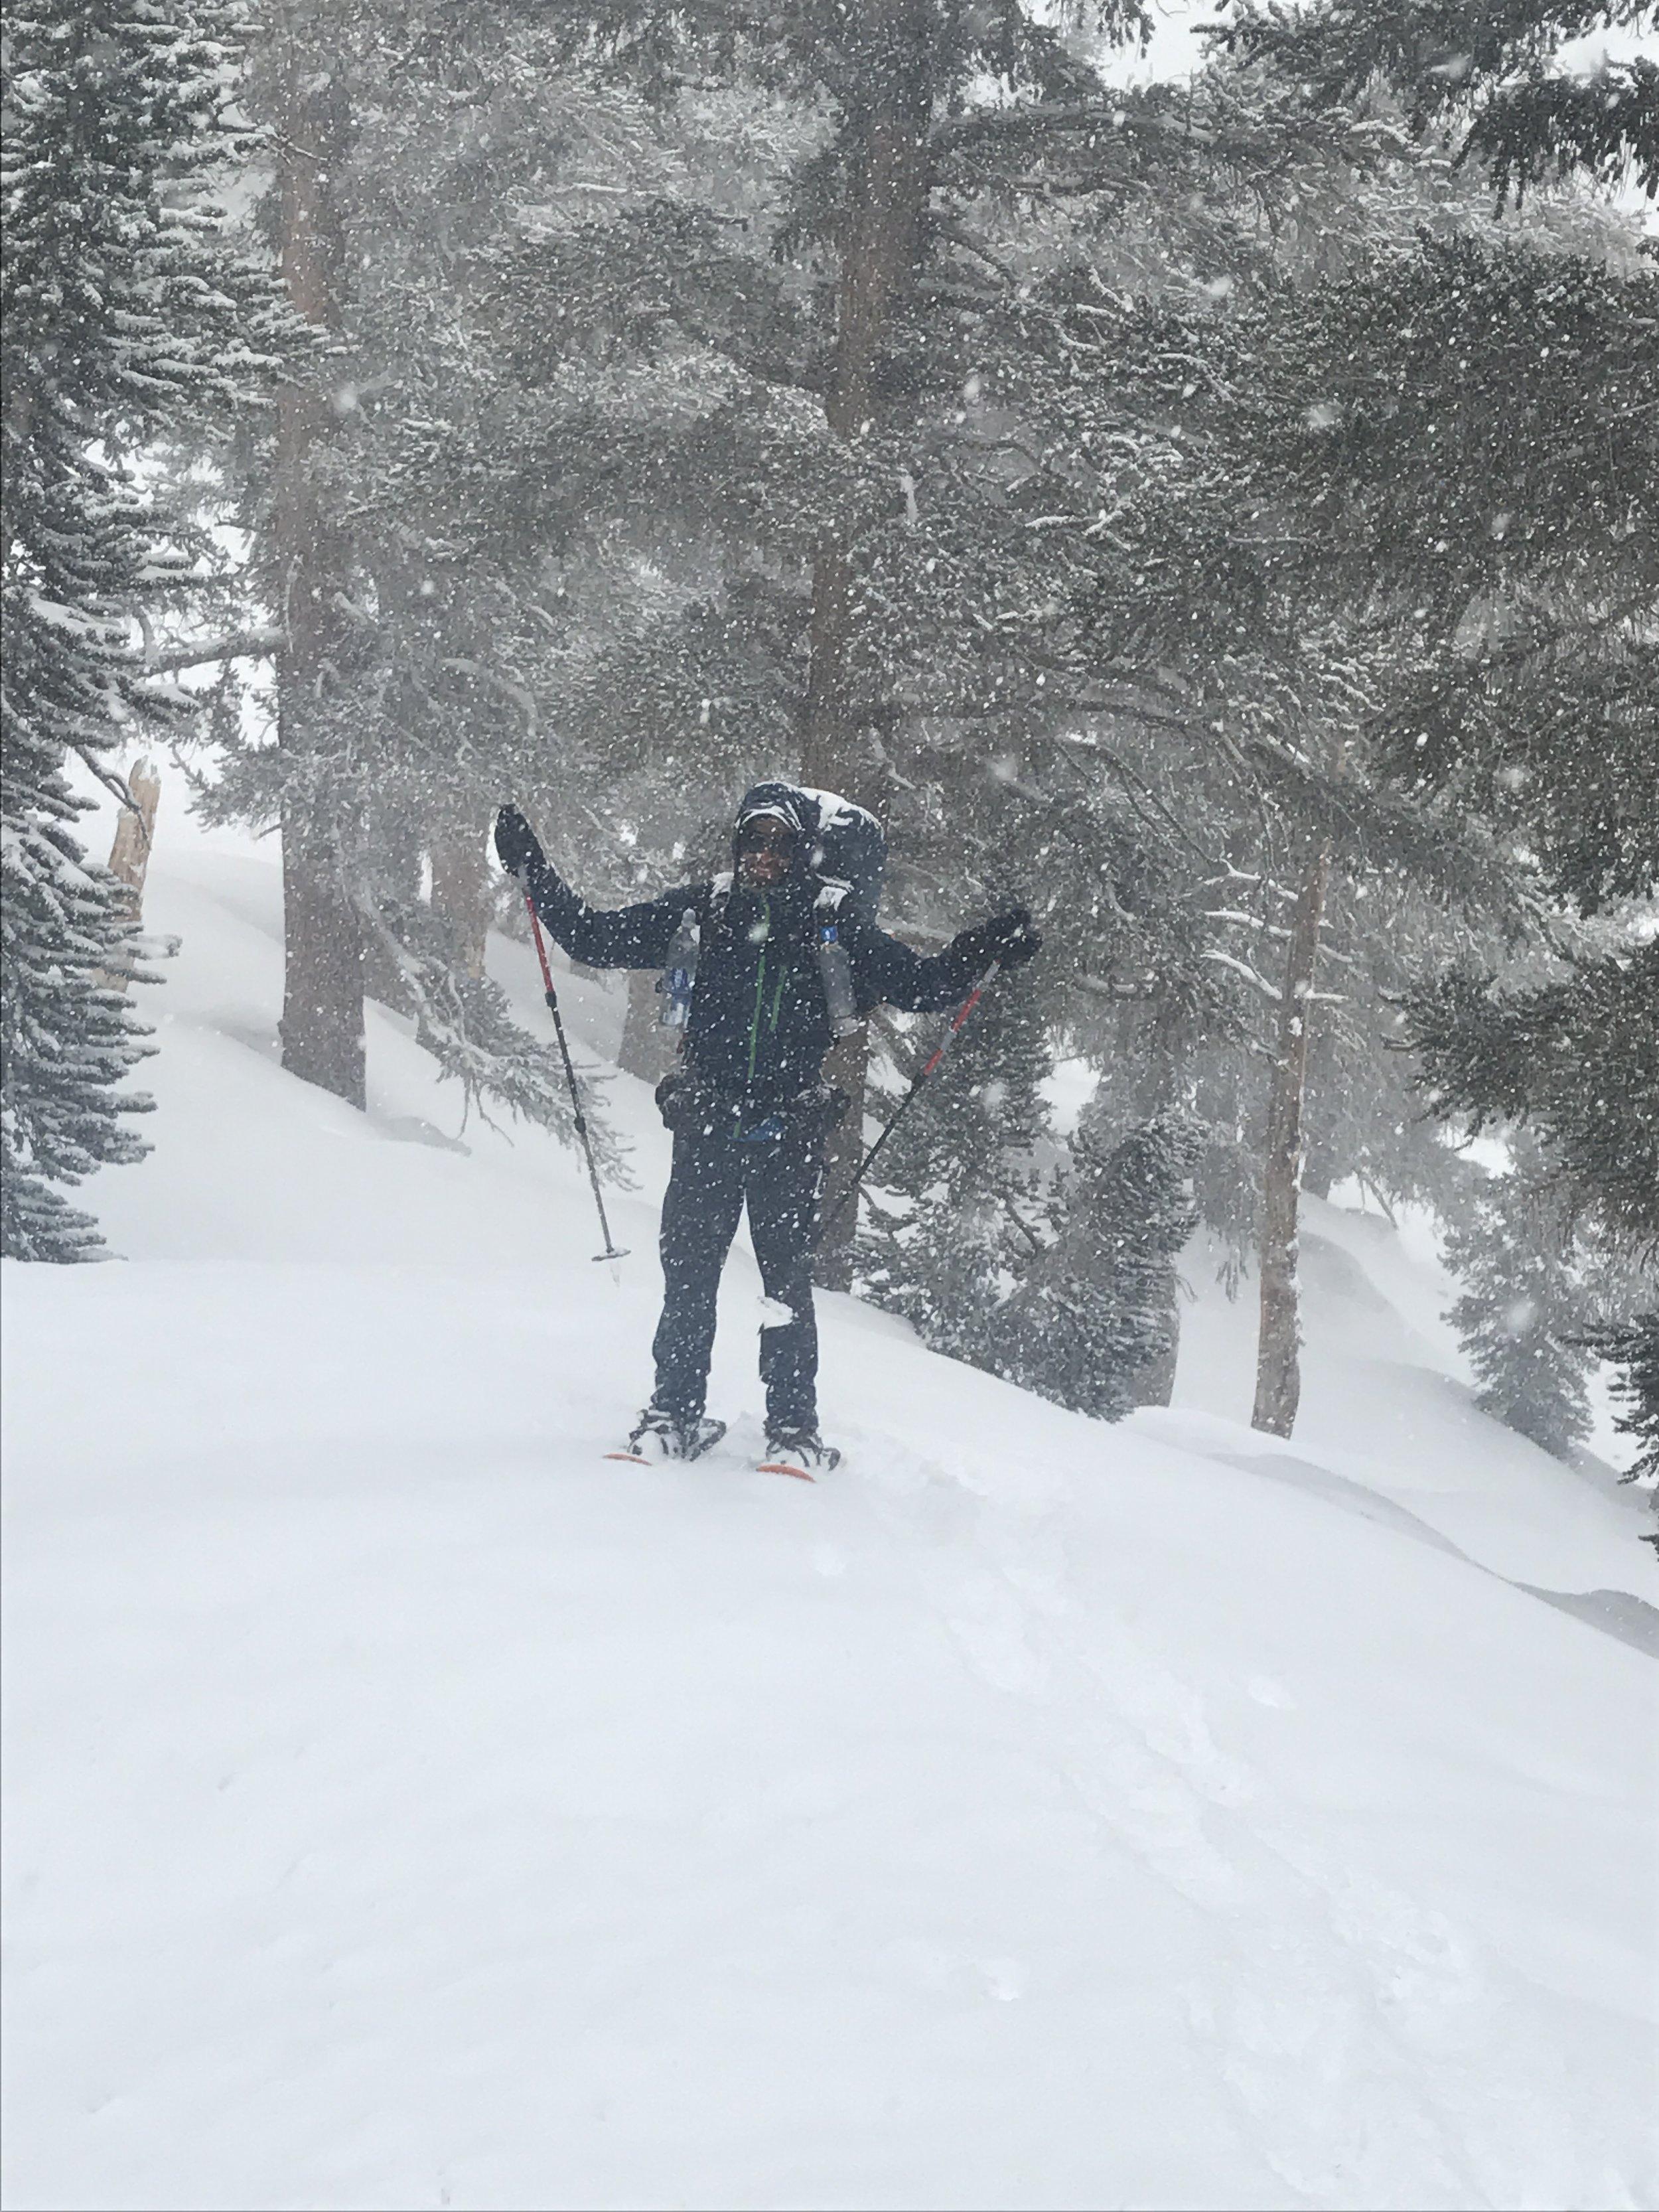 Sometimes, you get snowed on.